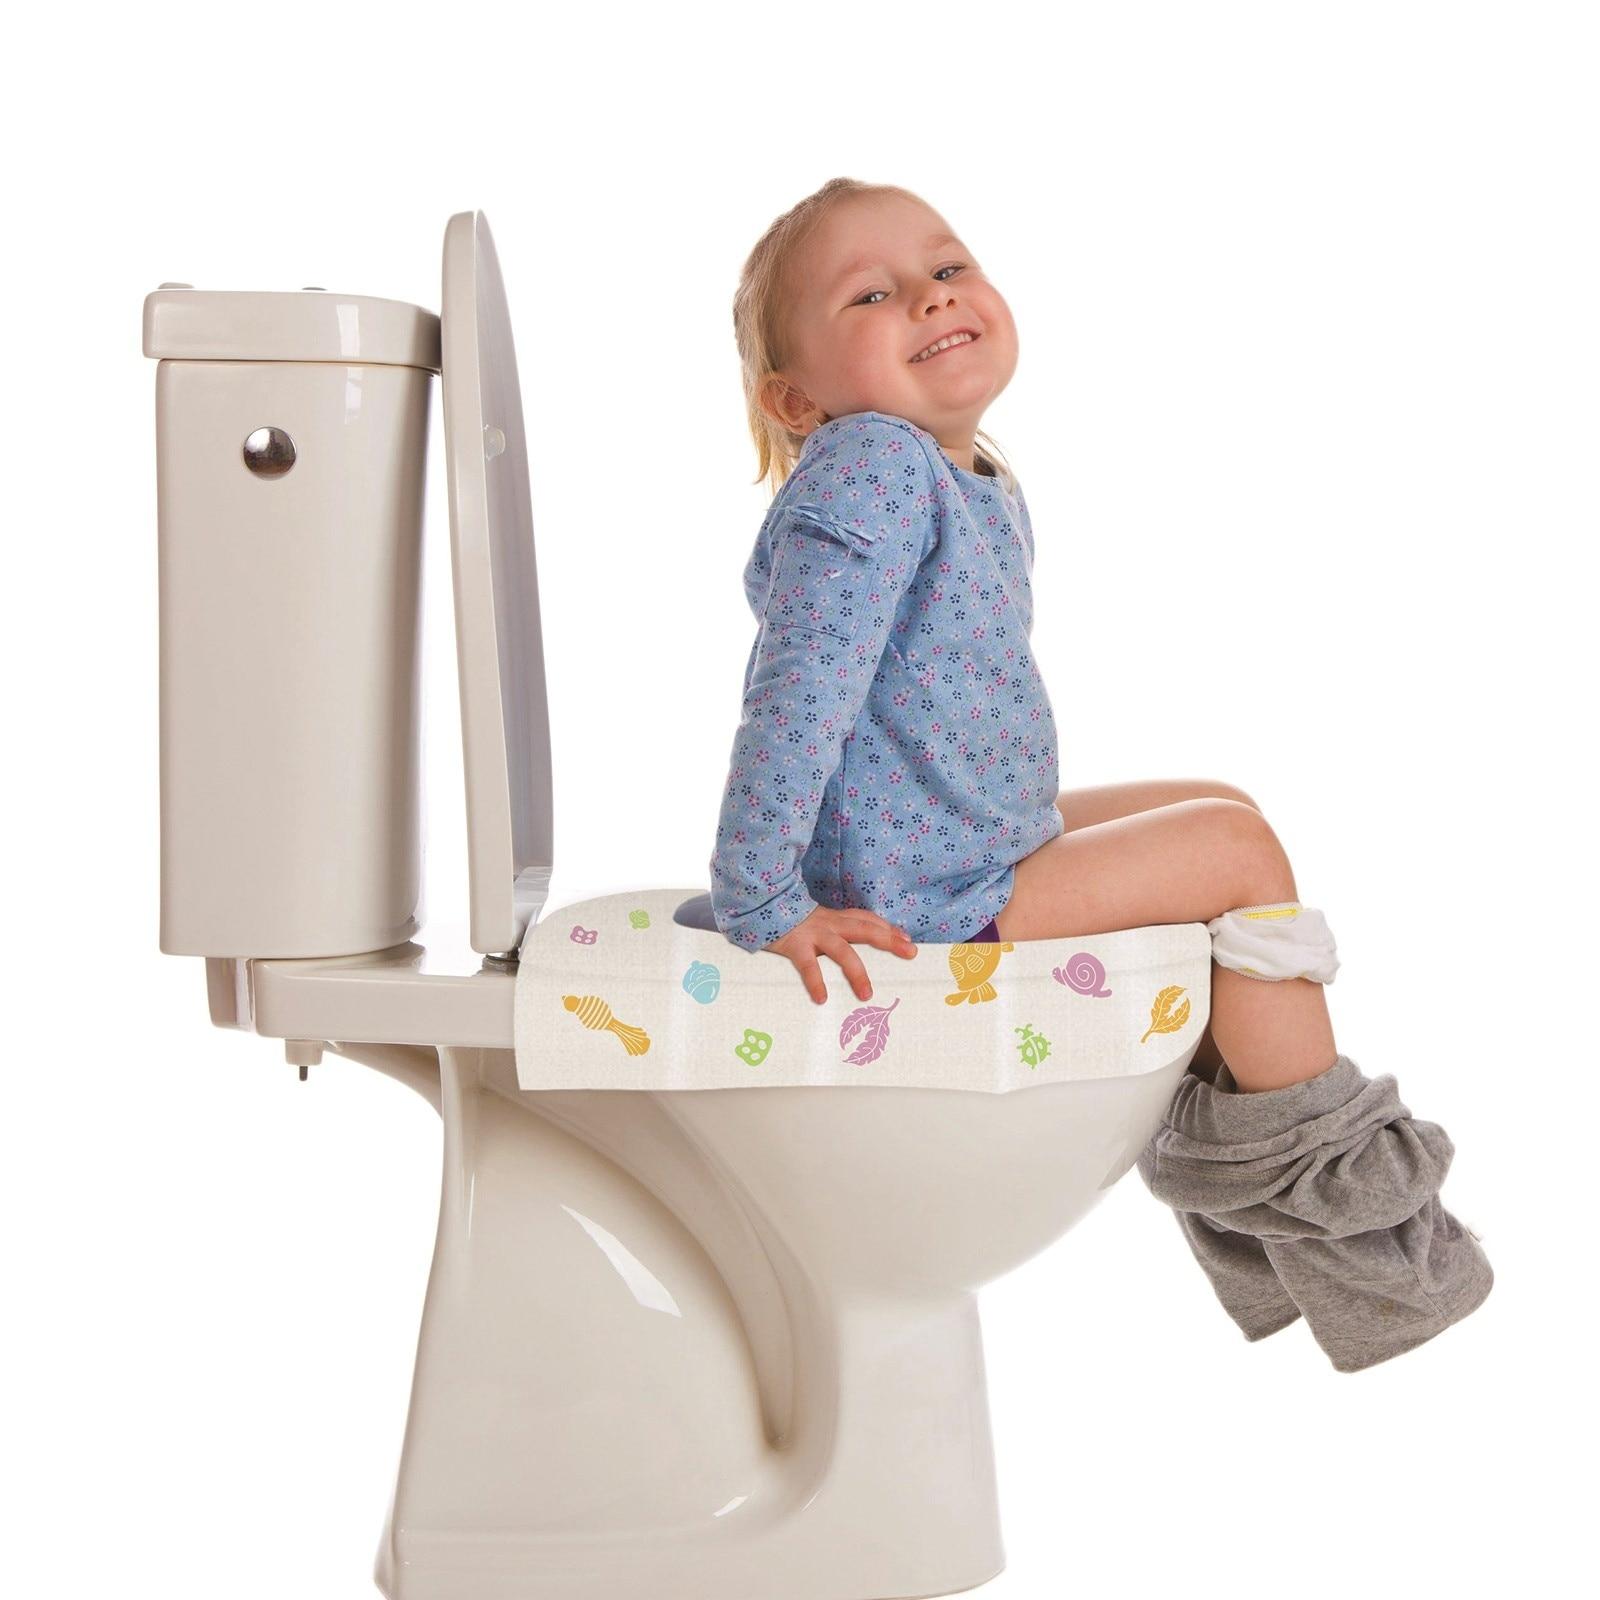 Ebebek Mycey Disposable Toilet Seat Potty Cover Protectors 10 Pcs